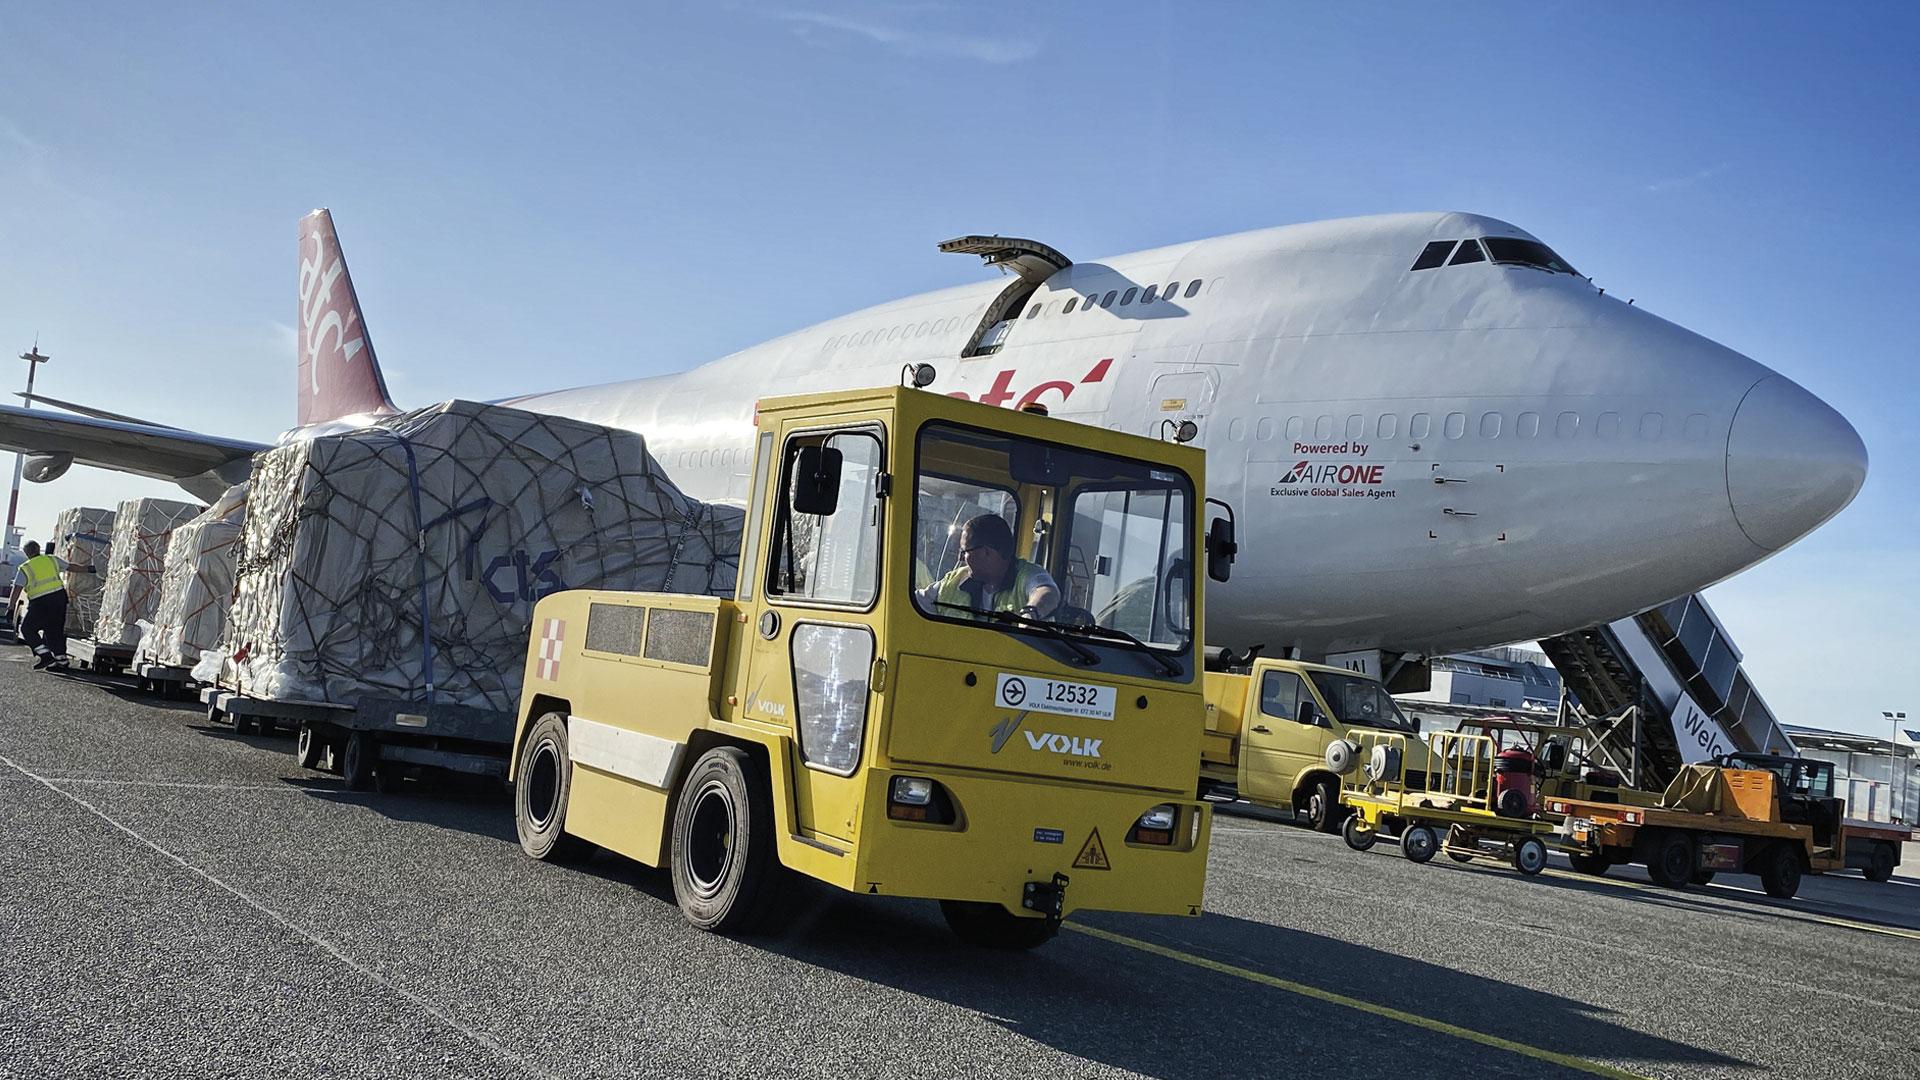 747 Cargo Plane being unloaded